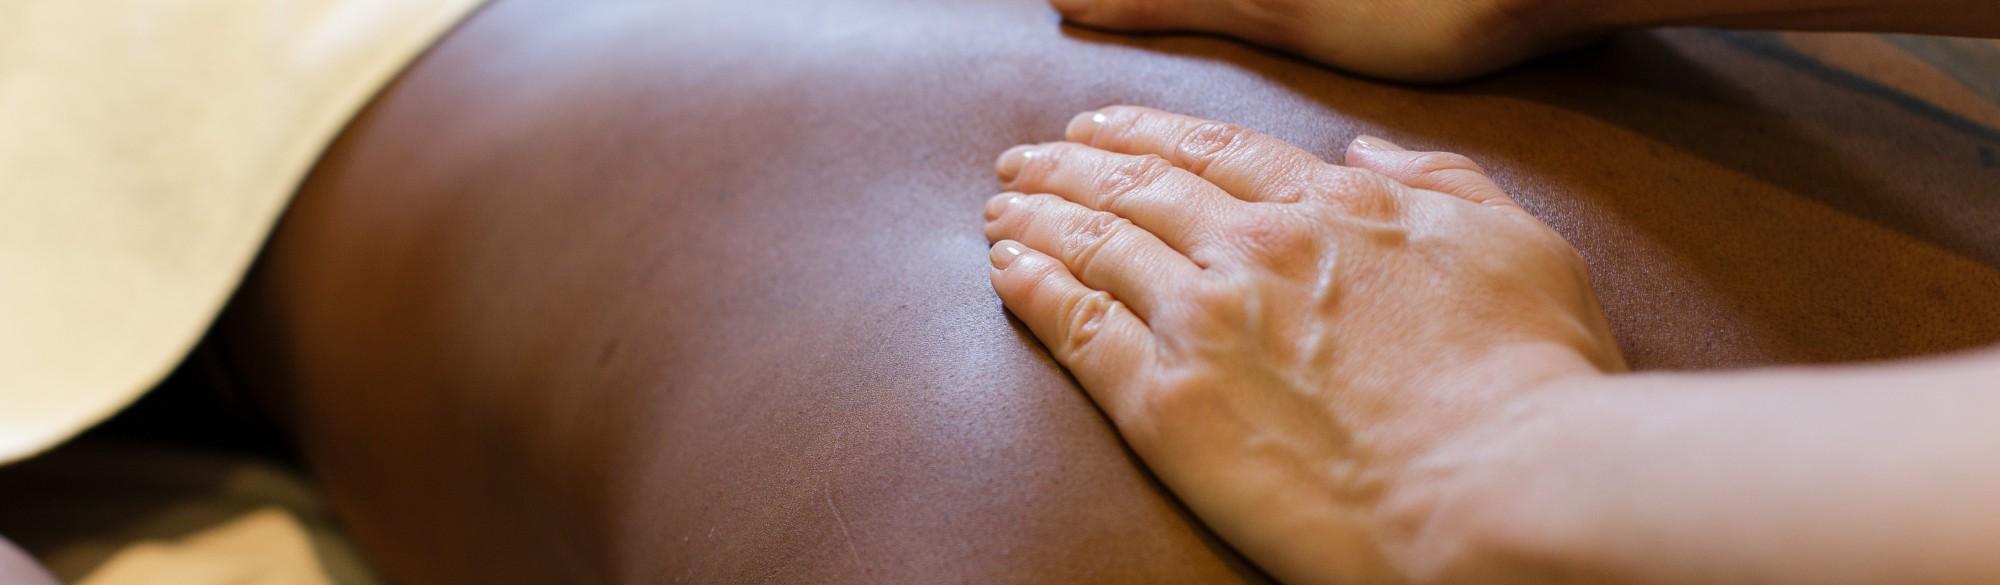 Gentleman's Massage